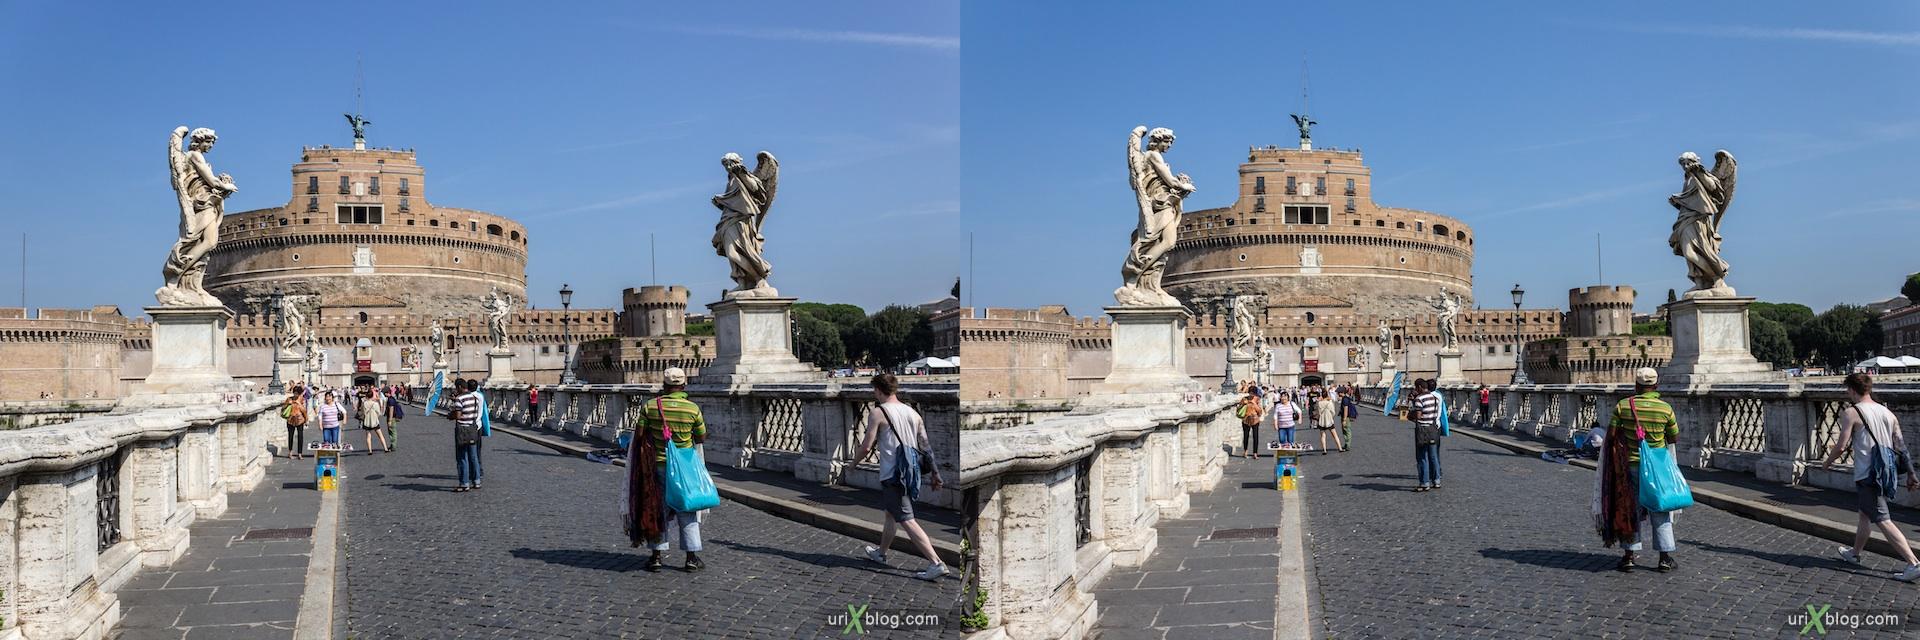 2012, Castel Sant Angelo, Mausoleum of Hadrian, bridge, 3D, stereo pair, cross-eyed, crossview, cross view stereo pair